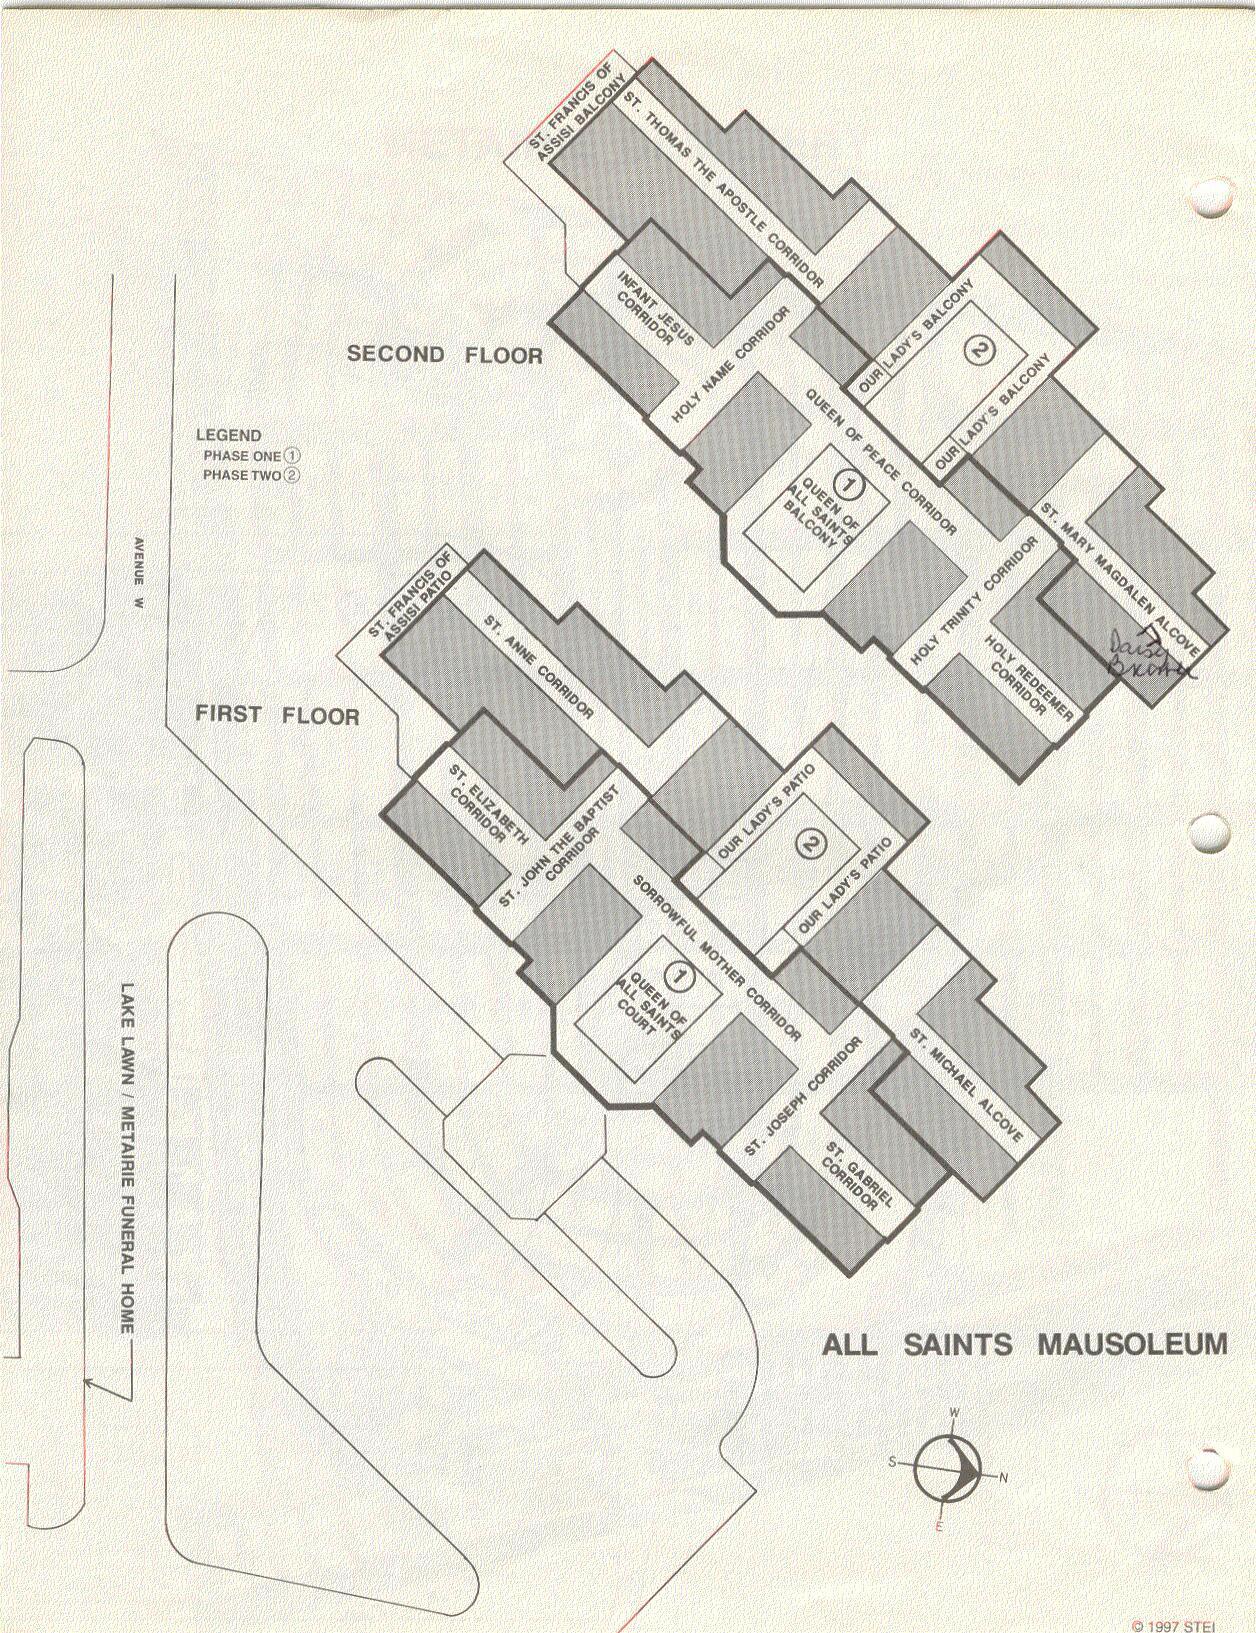 Metairie Cemetery Records Orleans Parish Archives LAGENWEB USGENWEB